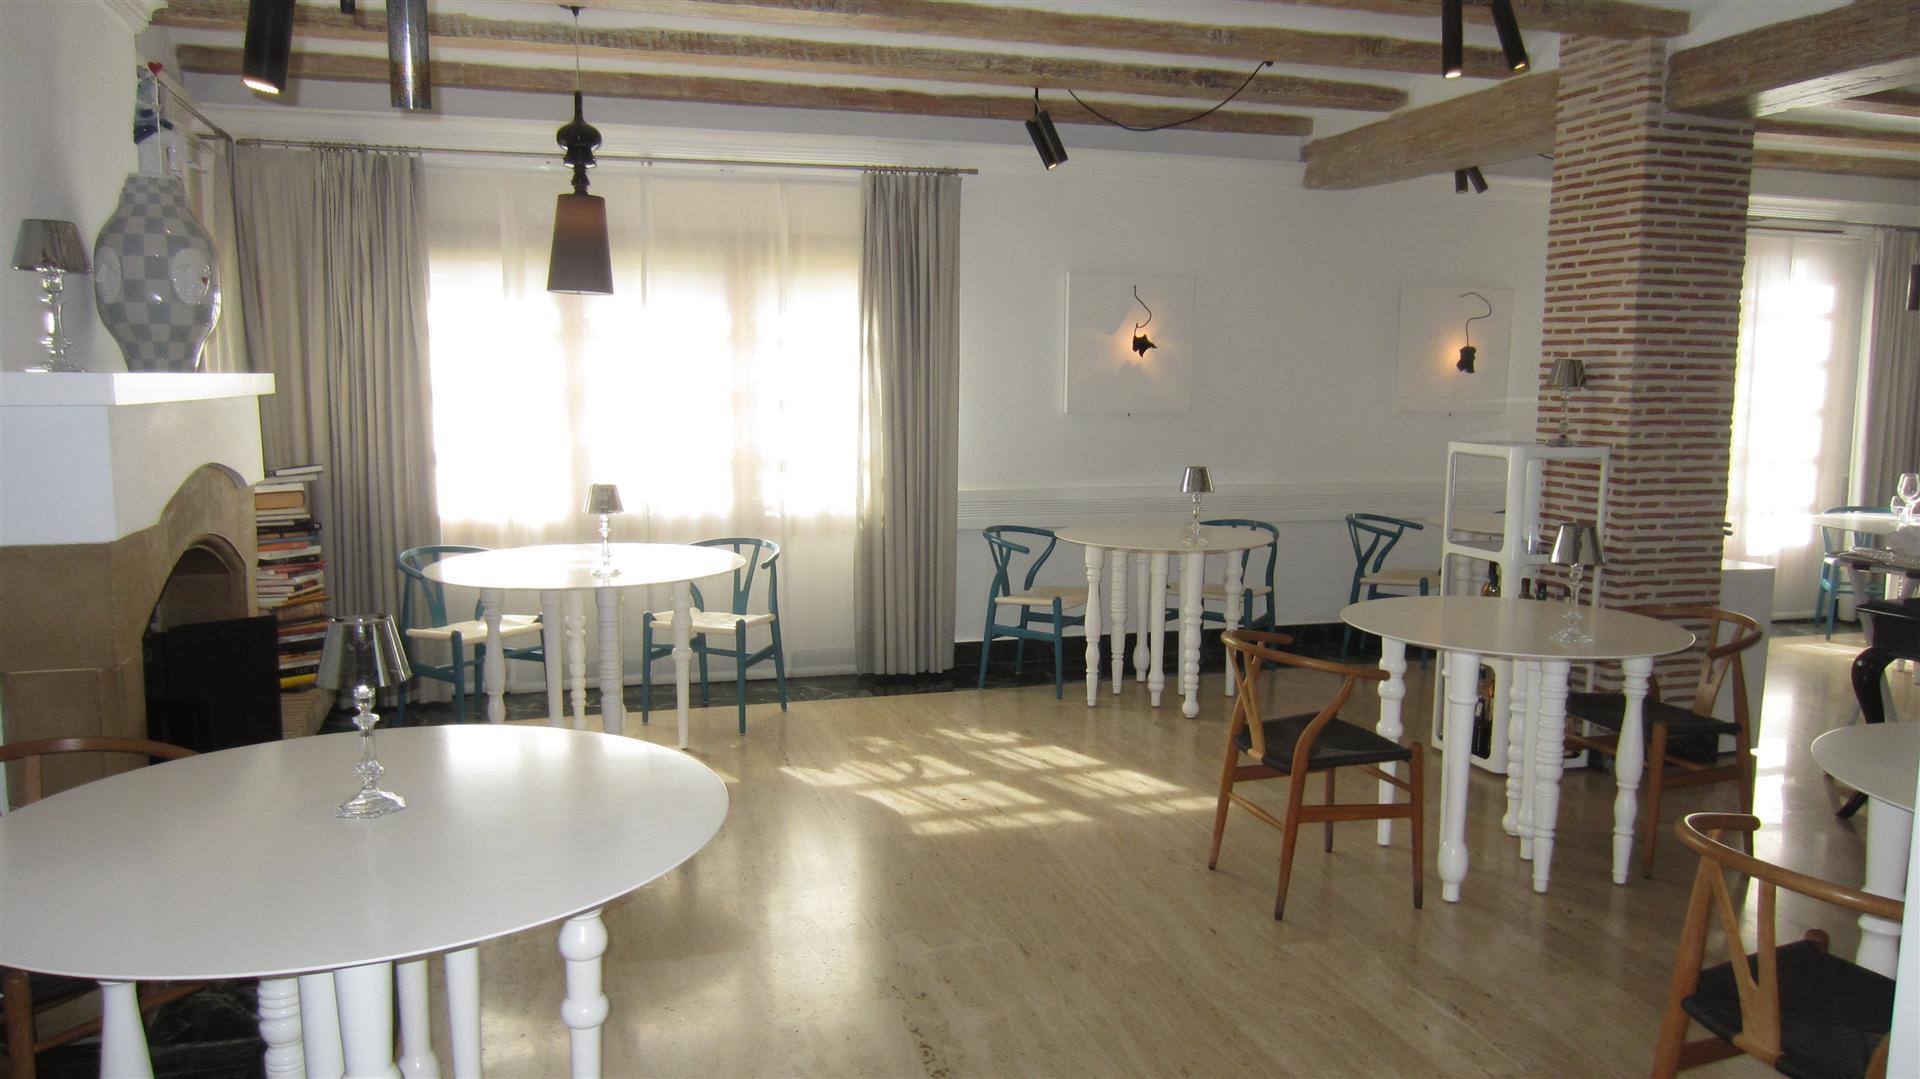 Ресторан Quique Dacosta (Испания)